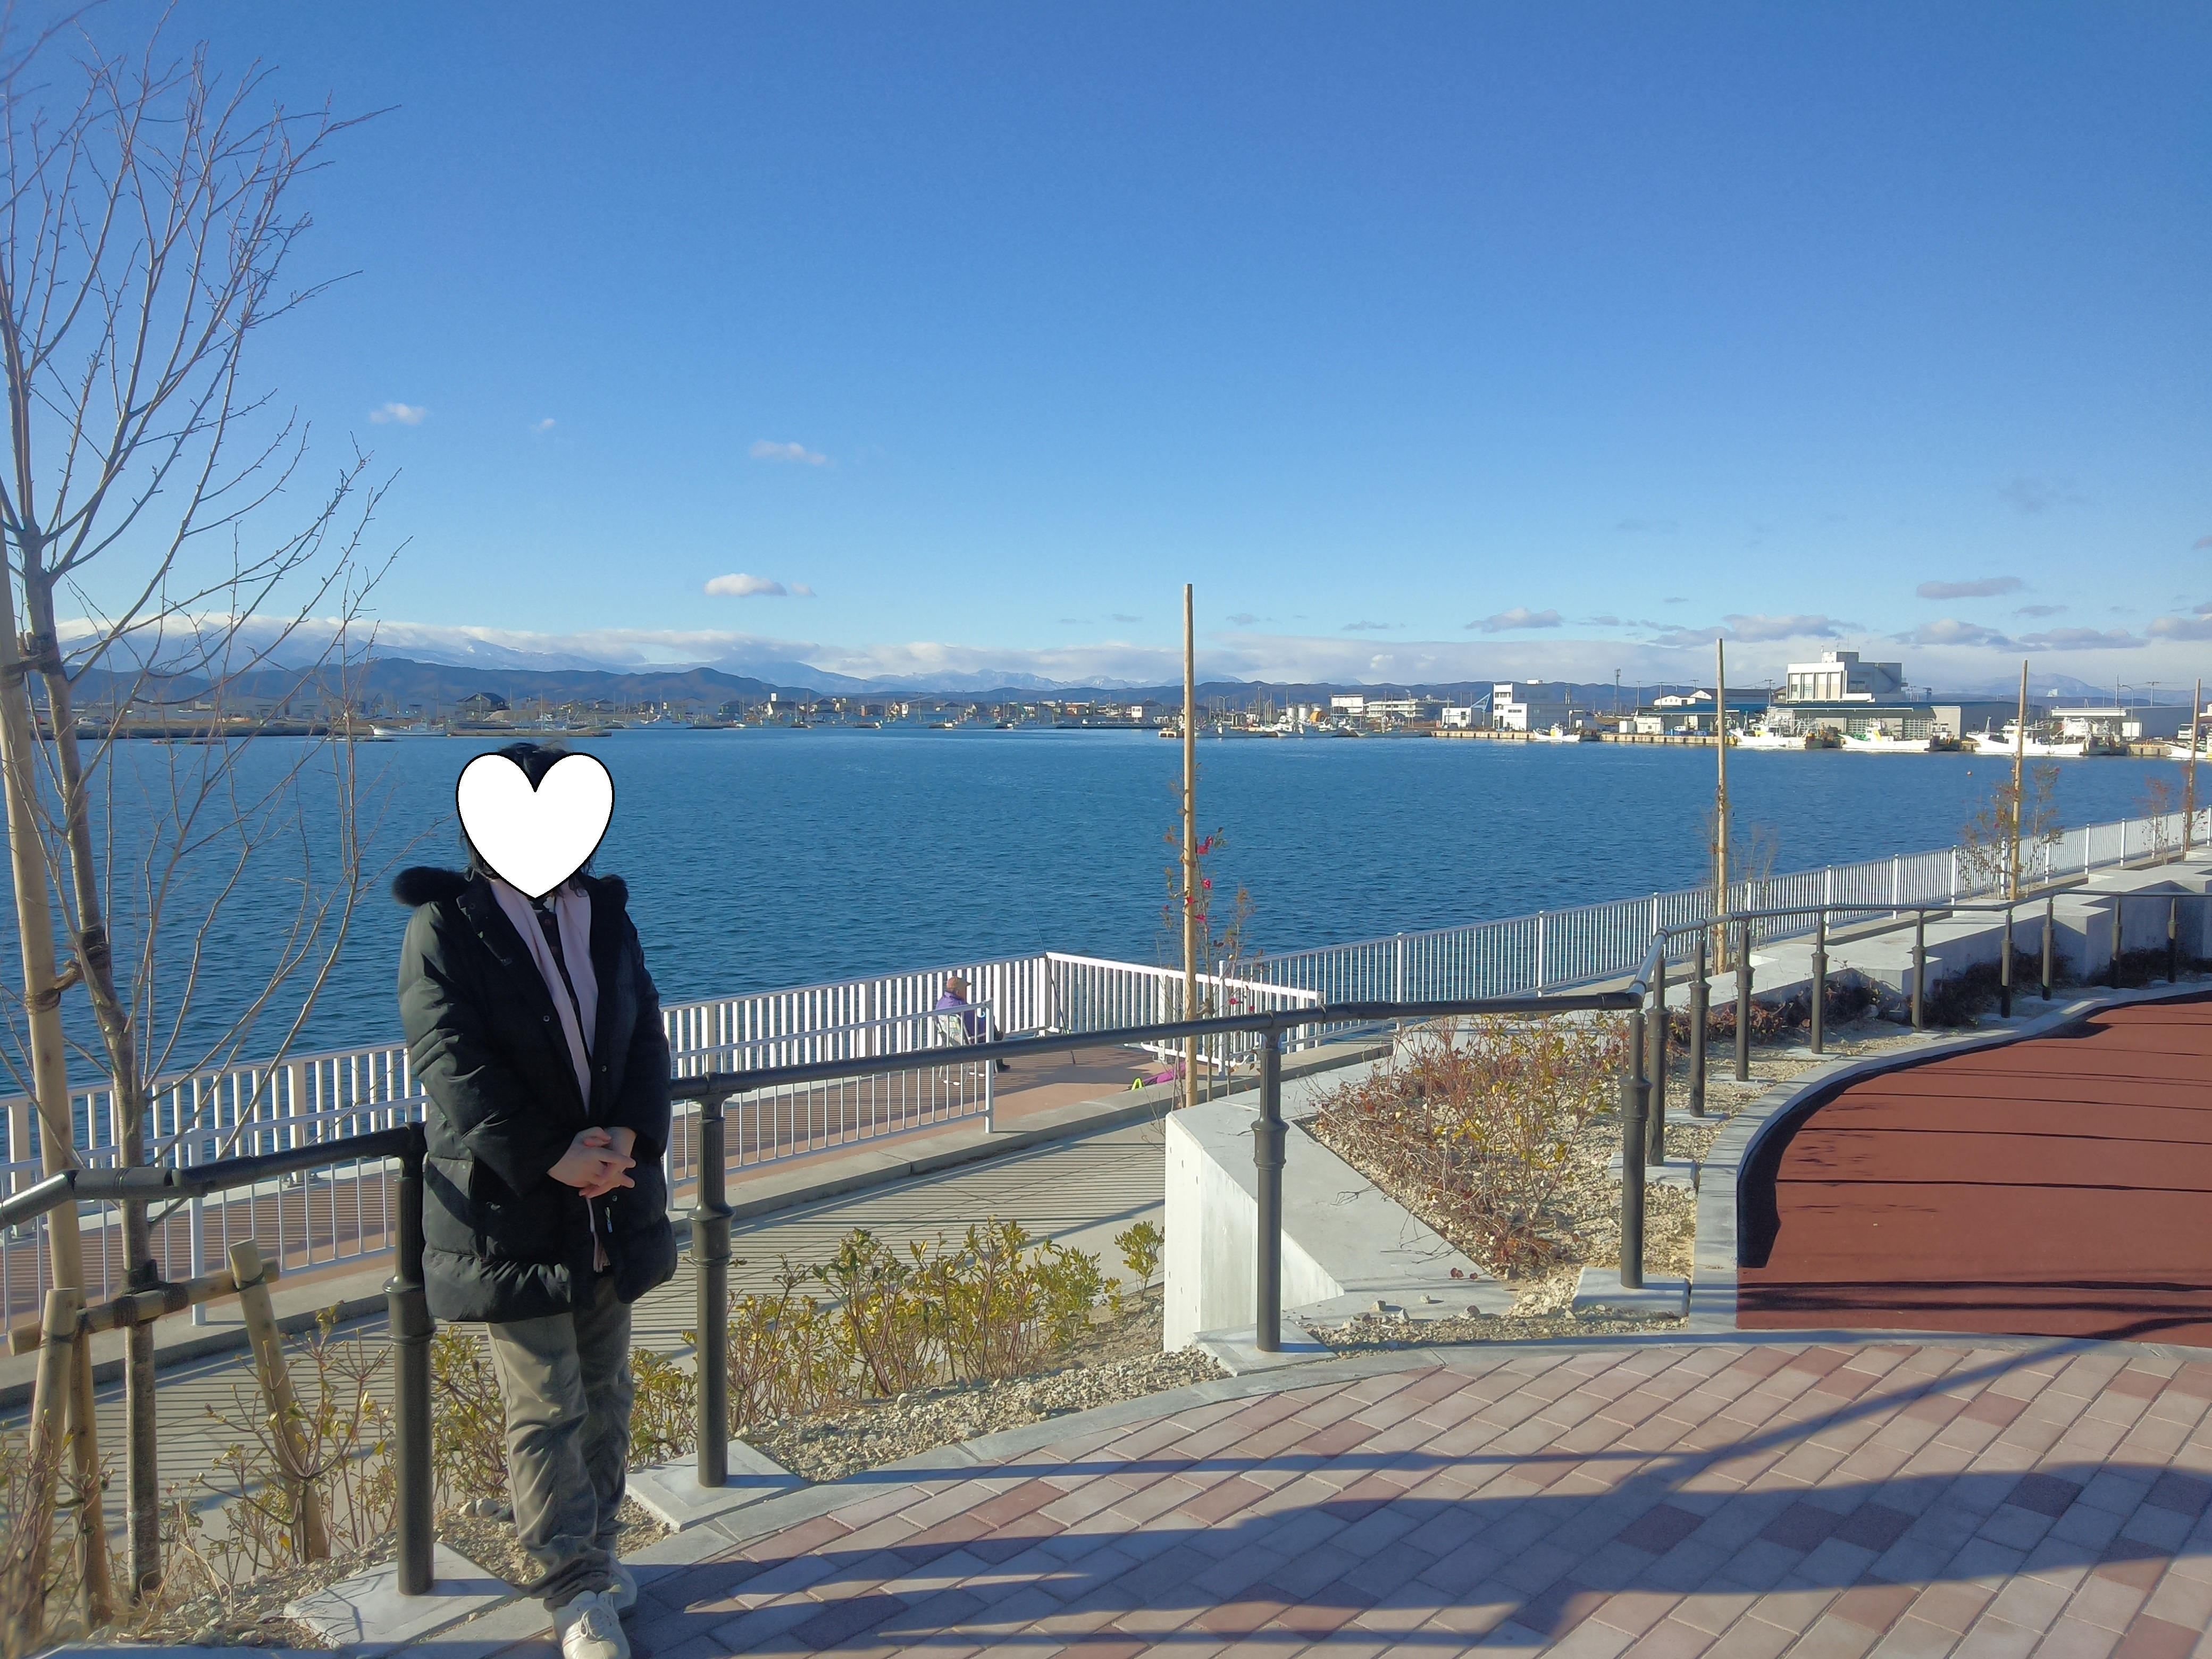 KIMG0510-1.jpg